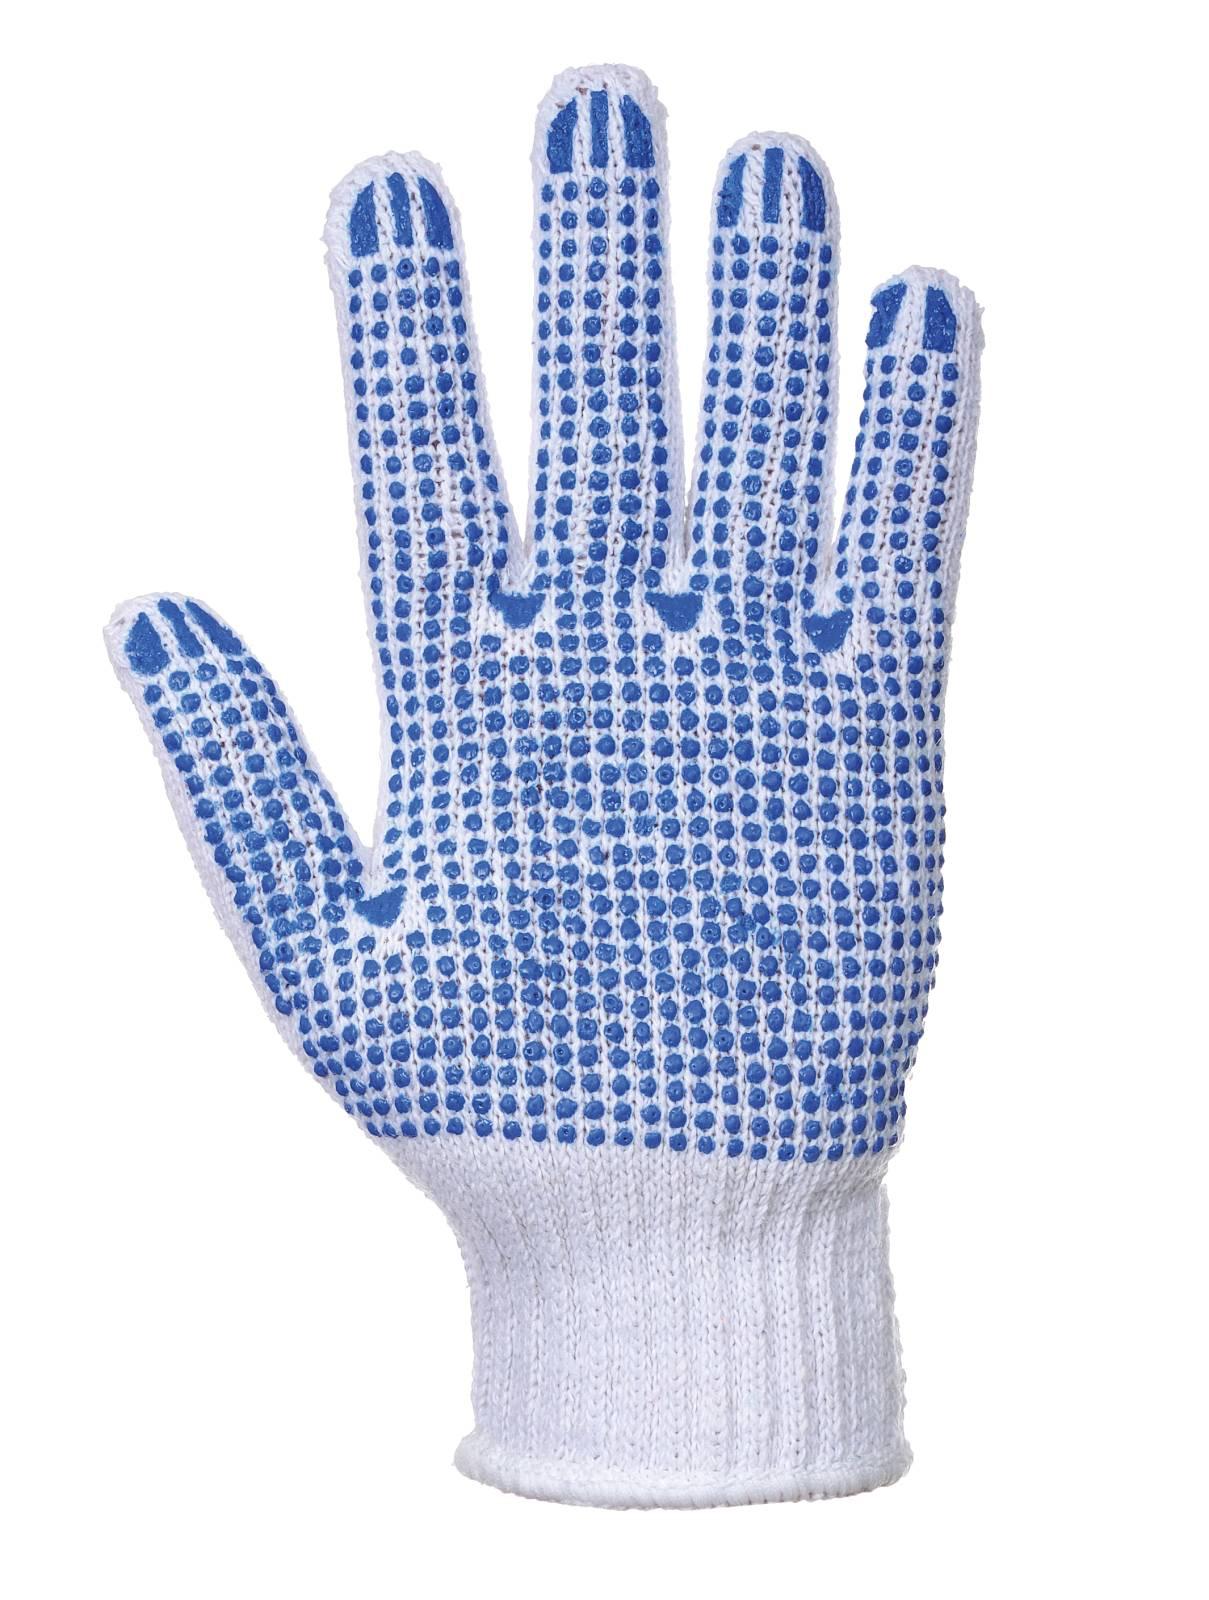 Portwest Handschoenen A111 wit-blauw(WB)